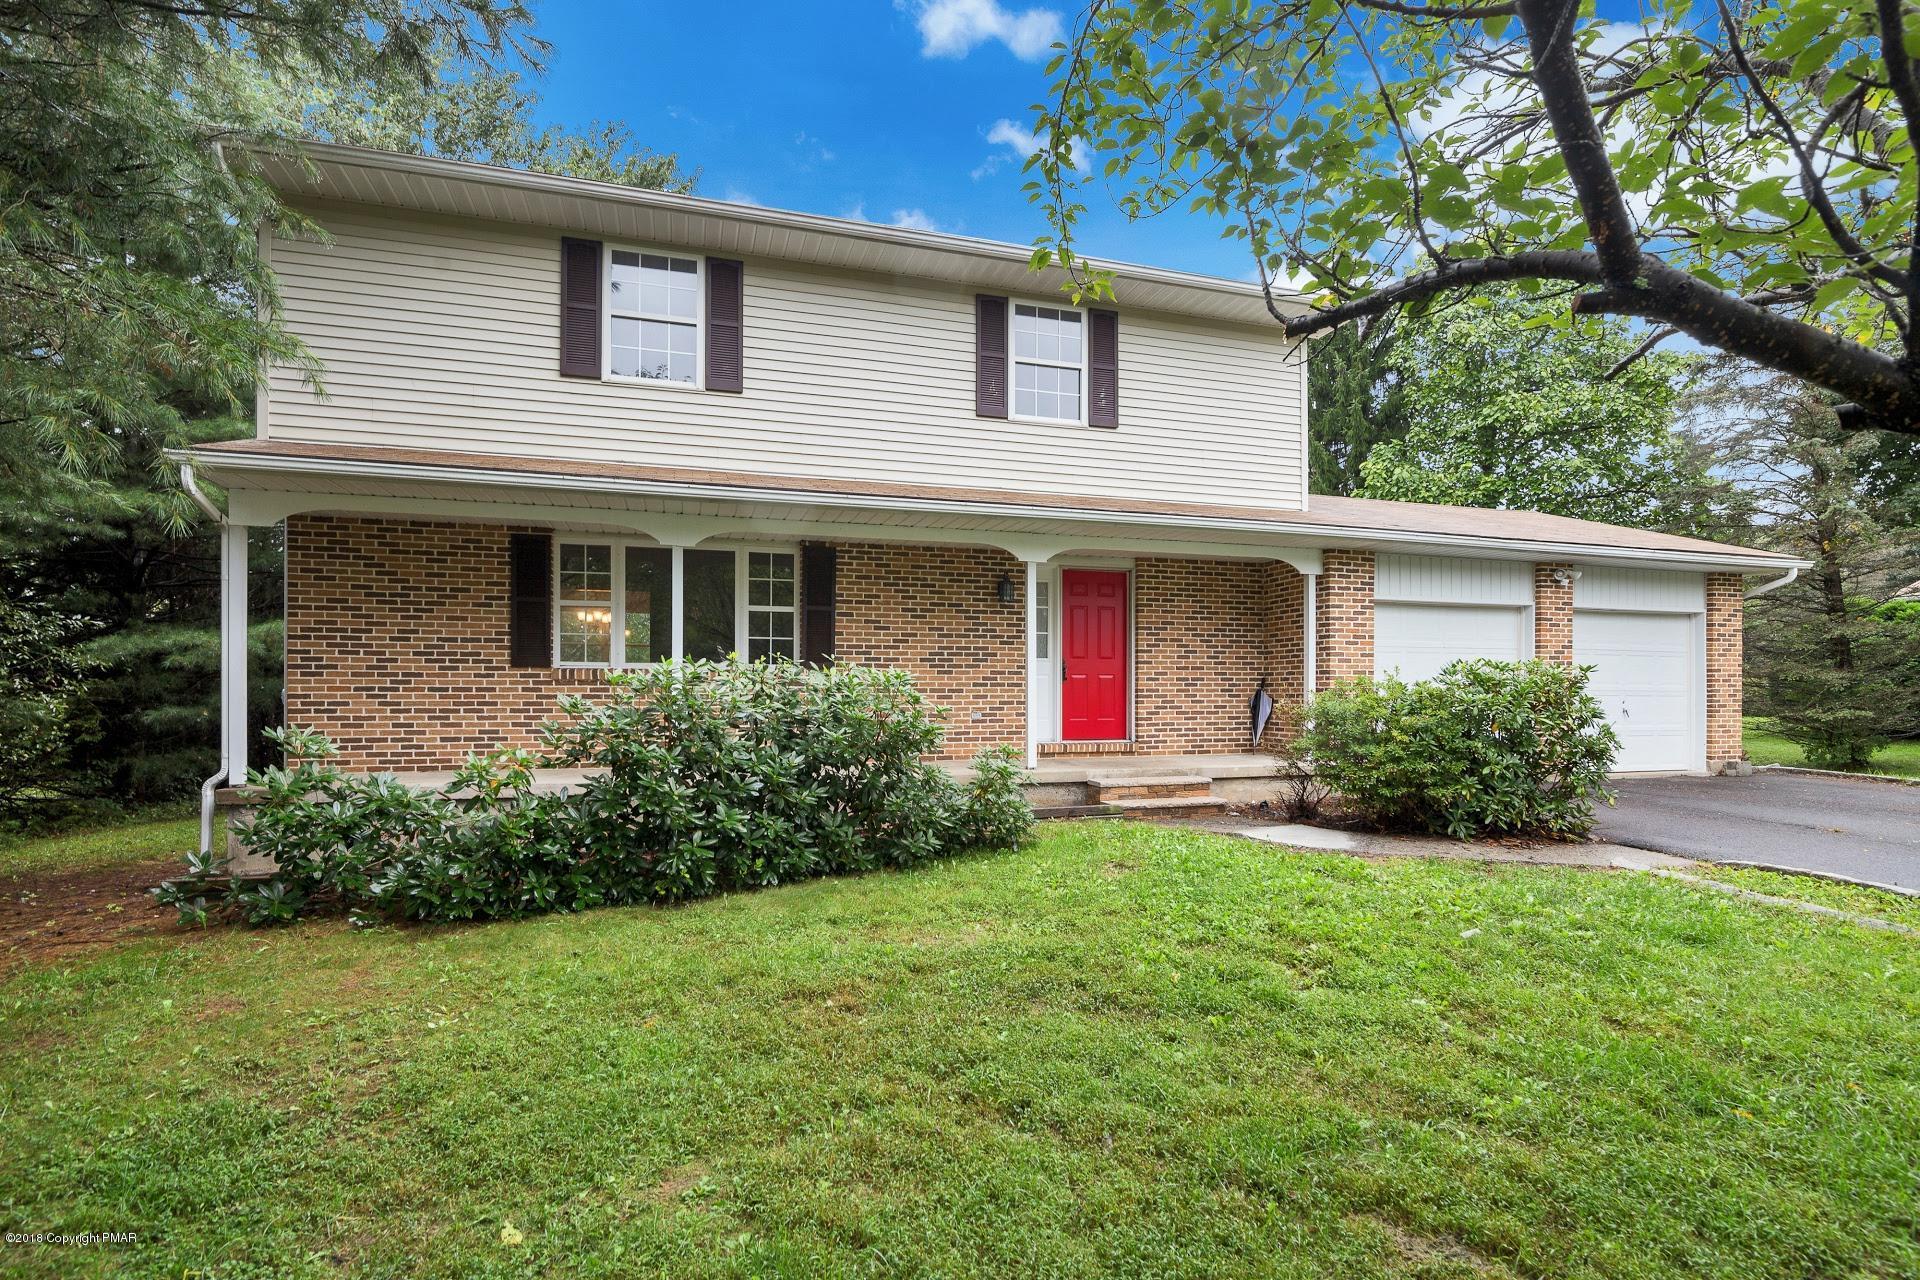 3425 Walnut Rd, Kunkletown, PA 18058